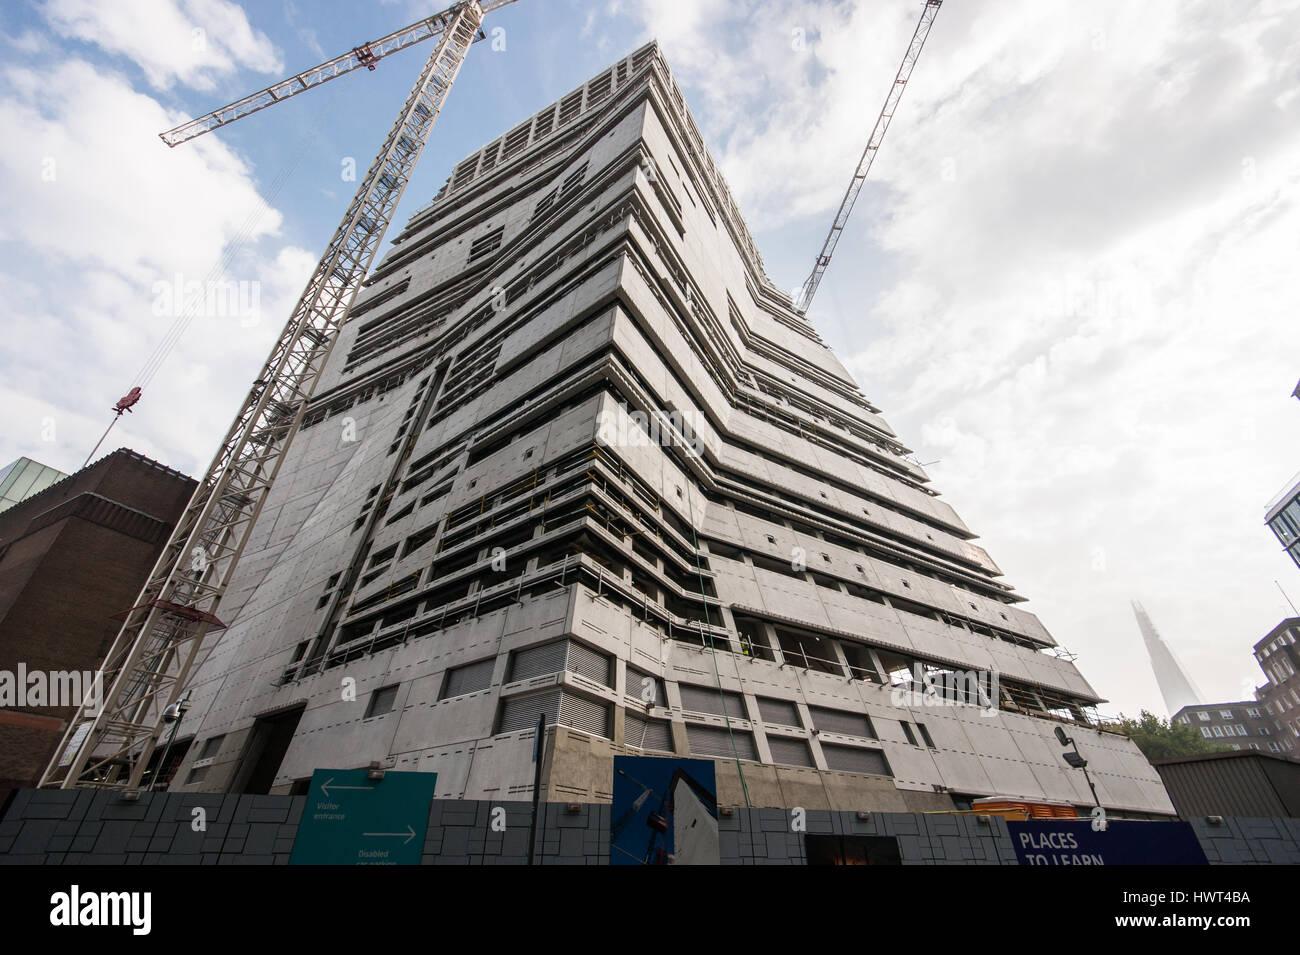 Tate Modern expansion by Herzog & de Meuron architects under construction in September 2014, London, Bankside - Stock Image